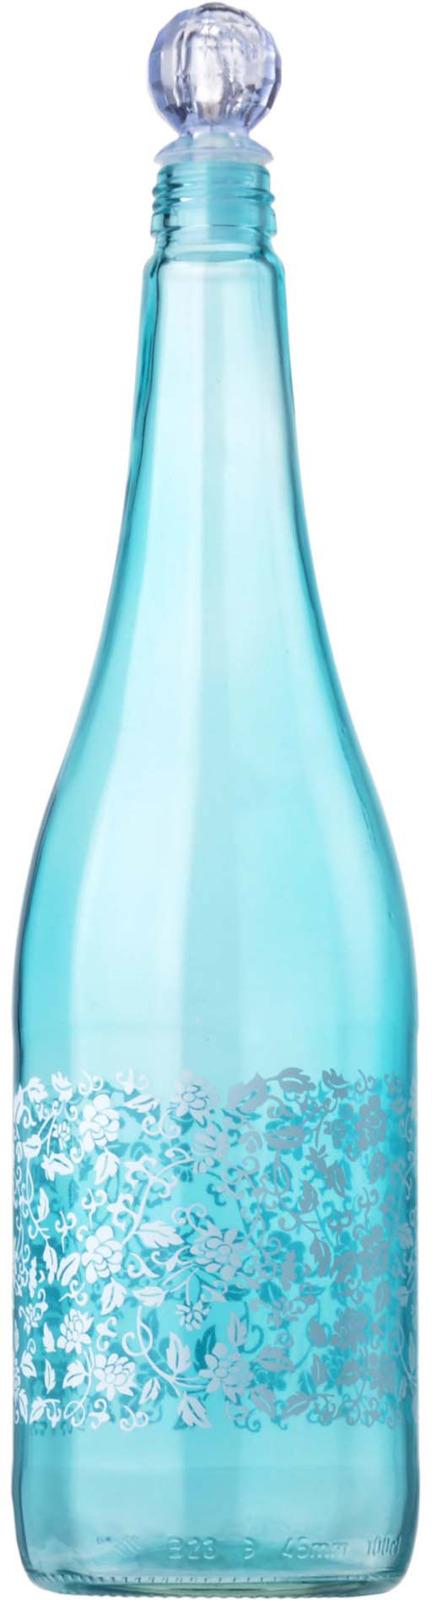 Бутылка Mayer & Boch, цвет: бирюзовый, 1 л